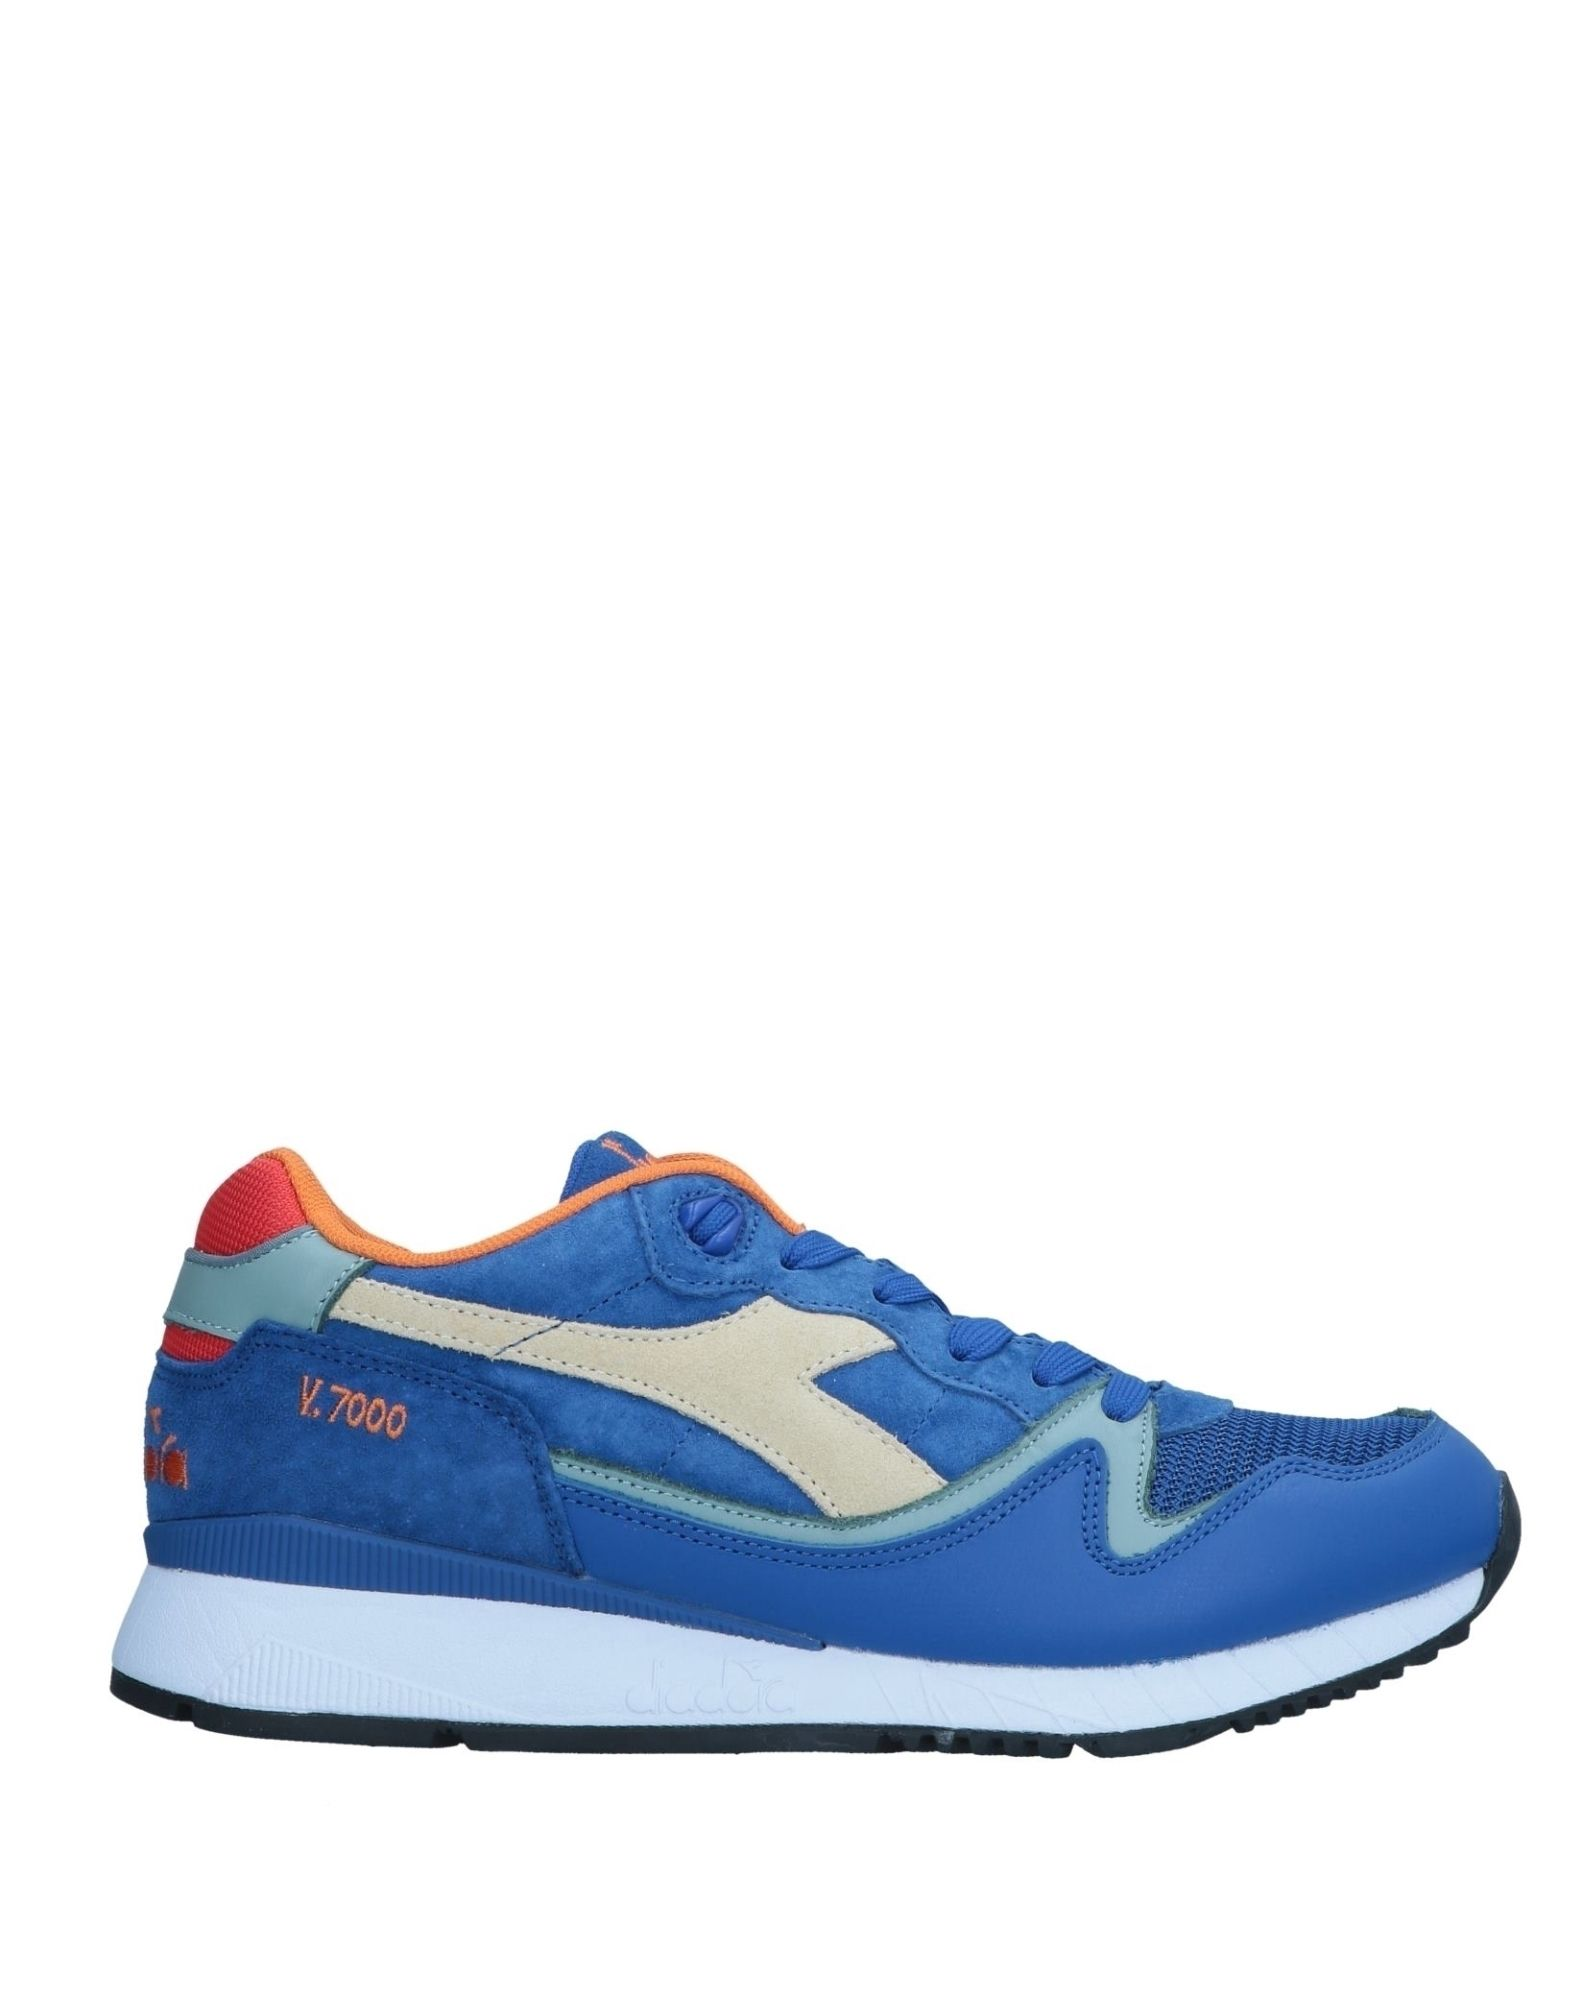 Diadora Sneakers Sneakers - Men Diadora Sneakers Diadora online on  United Kingdom - 11546782XB 483e2e